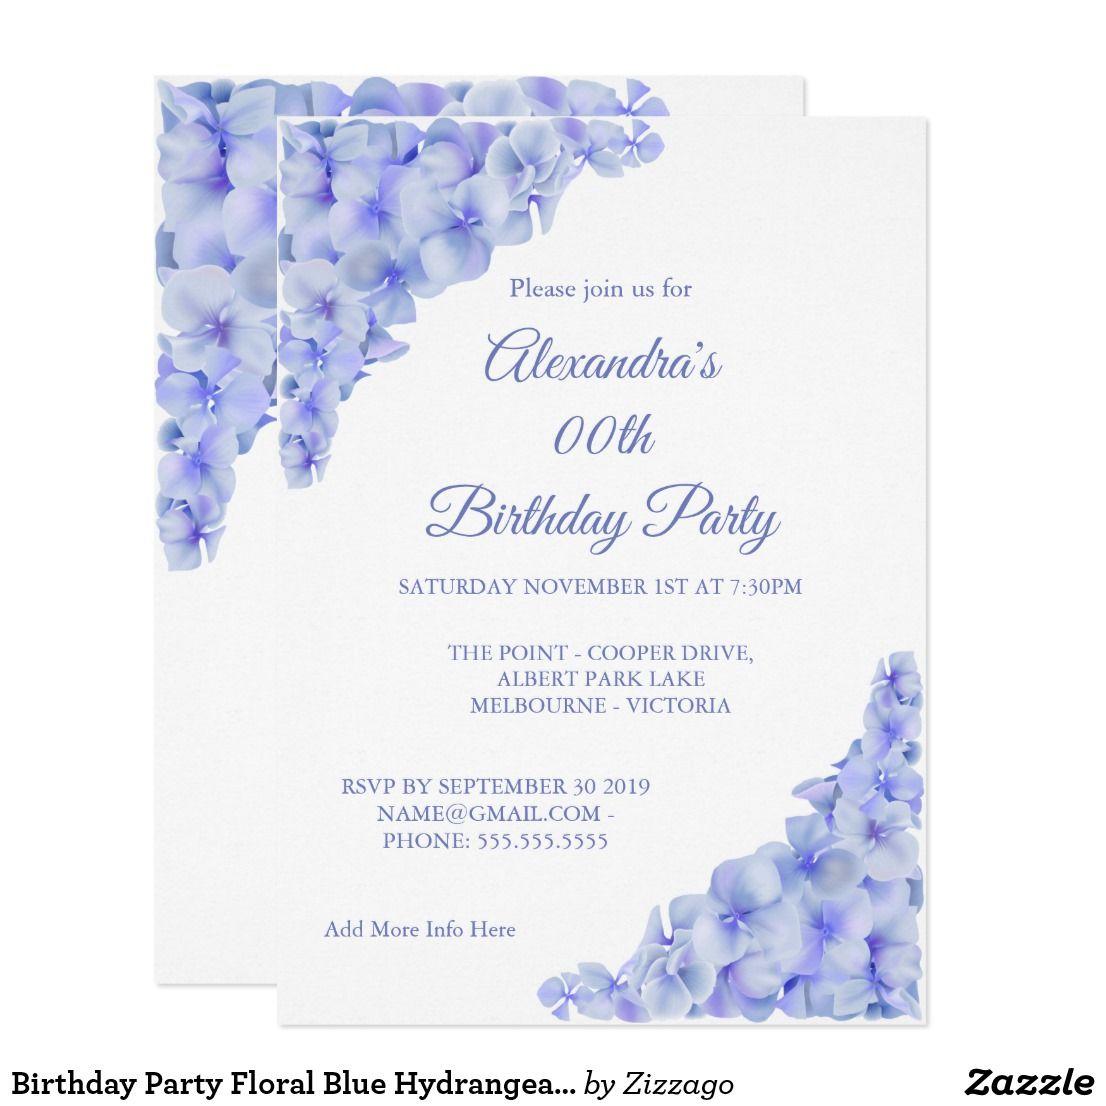 Birthday Party Floral Blue Hydrangeas White Invitation Floral